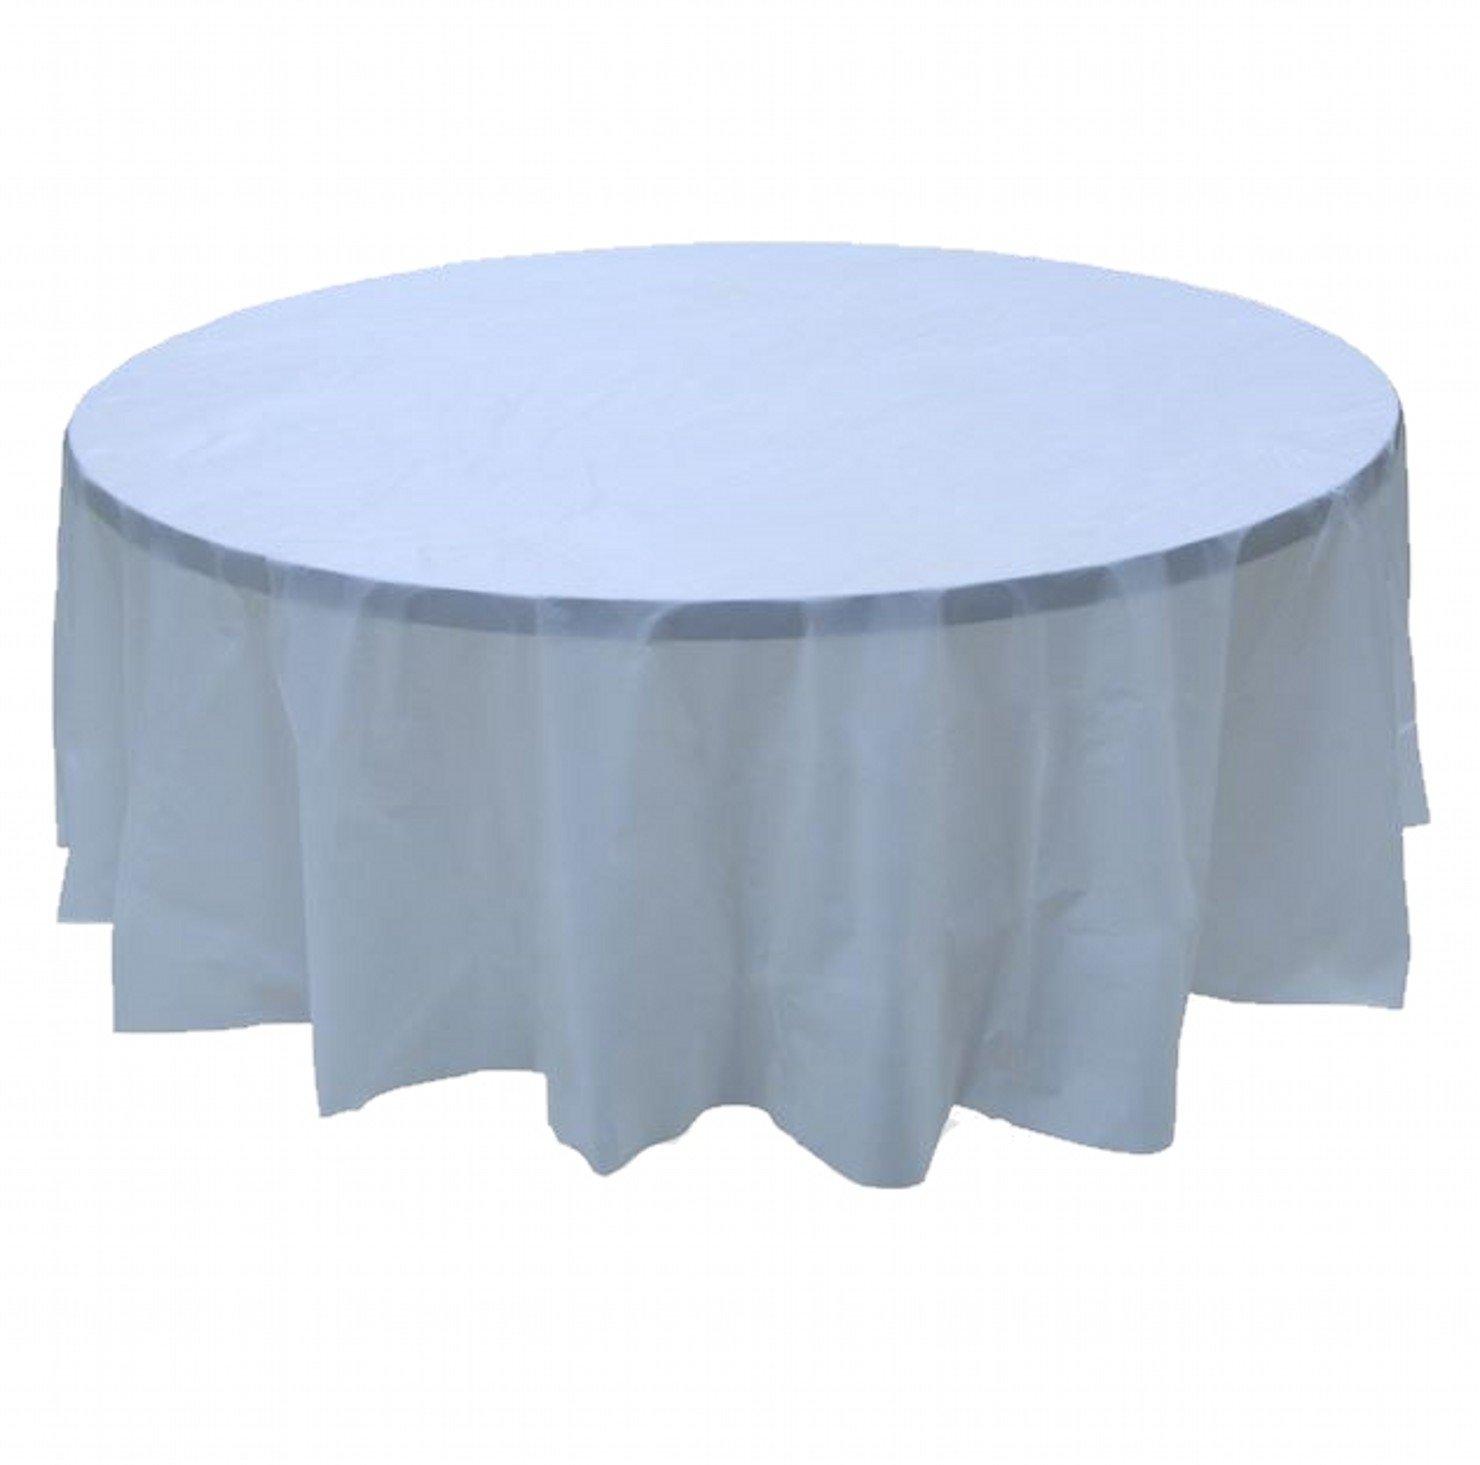 24 pcs (1 case) of Plastic Heavy Duty Premium Round tablecloths 84'' Diameter Table Cover - Light Blue by CC